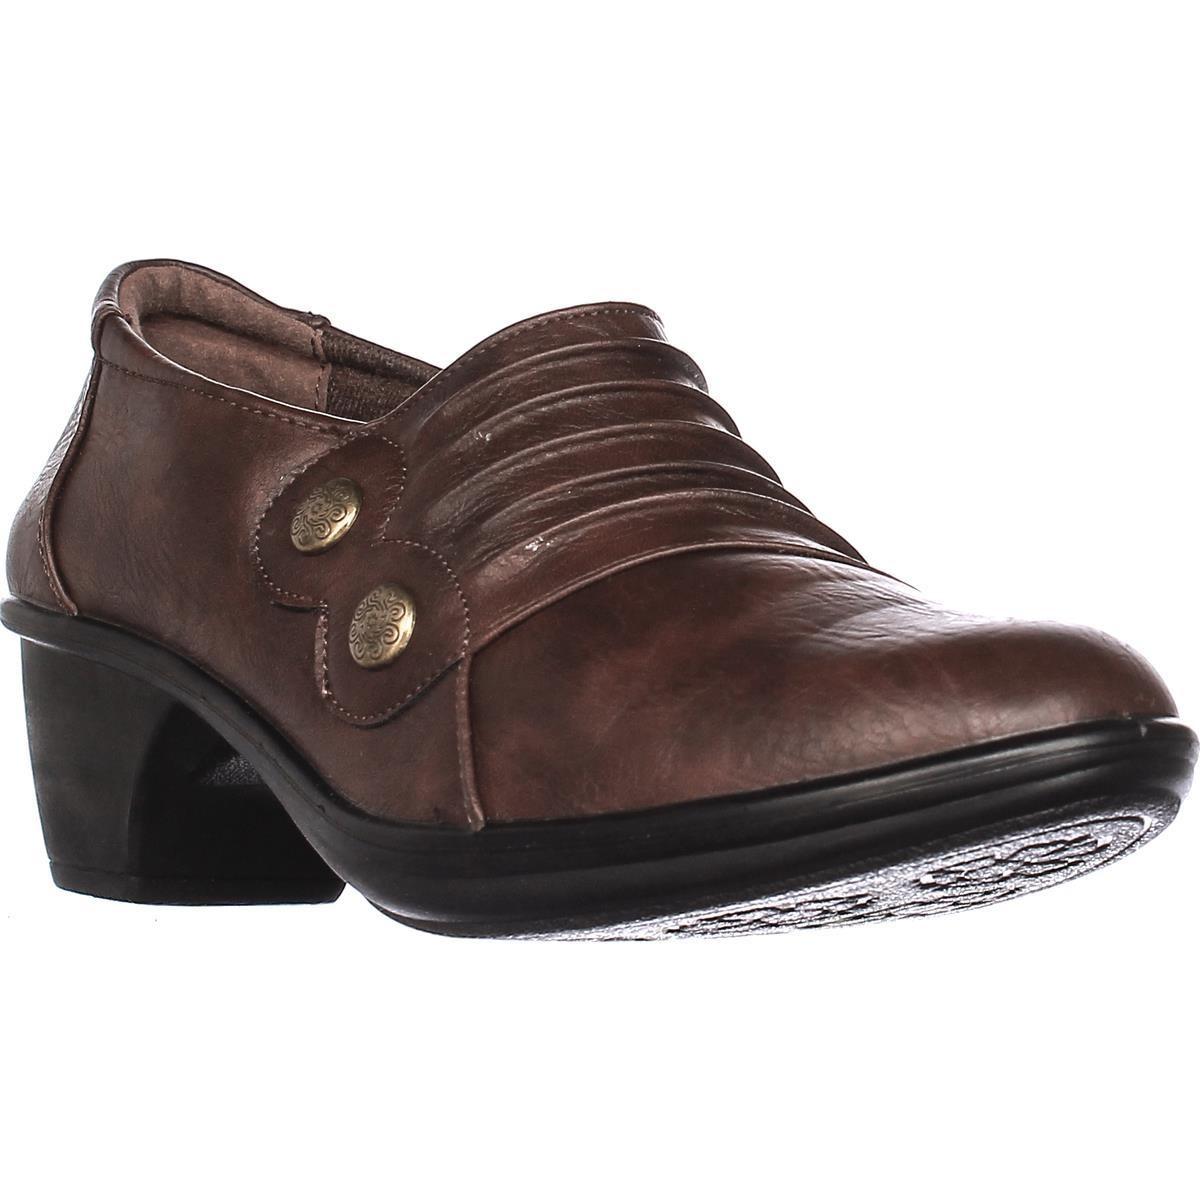 Easy Street Womens Edison Round Toe Clogs Tan Size 11.0